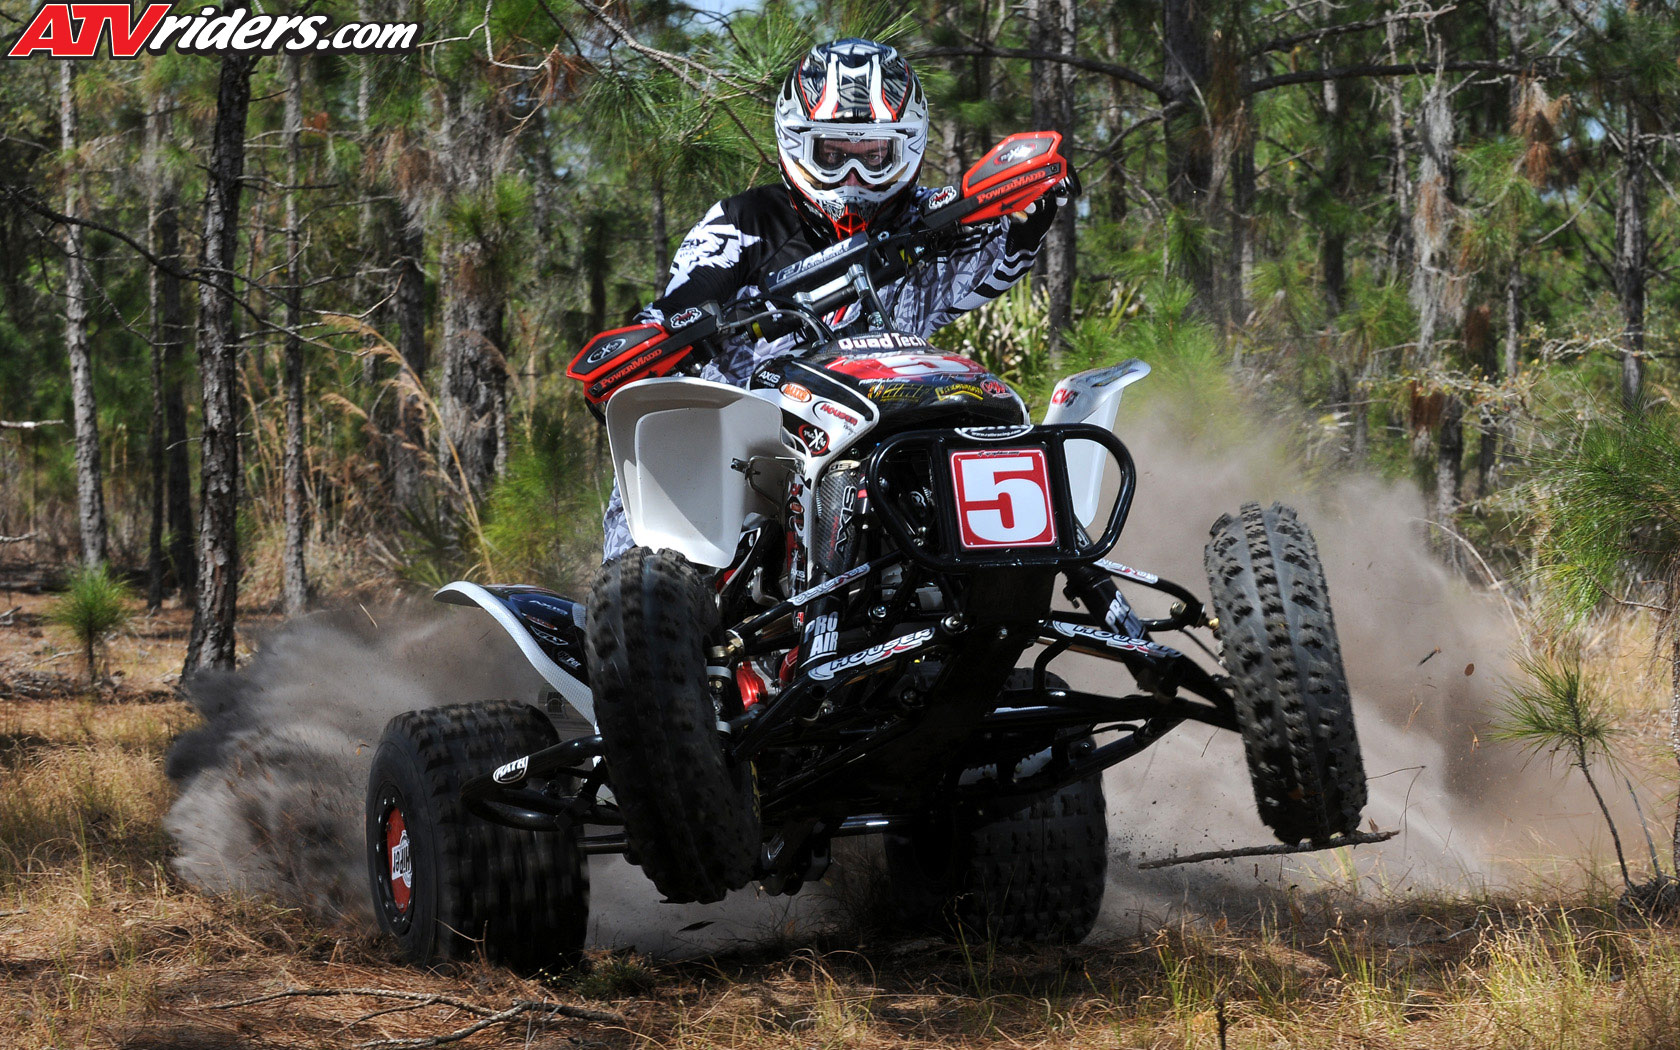 Maxxis Houser Racings Bryan Cook On His Honda 450R   Wednesday 1680x1050